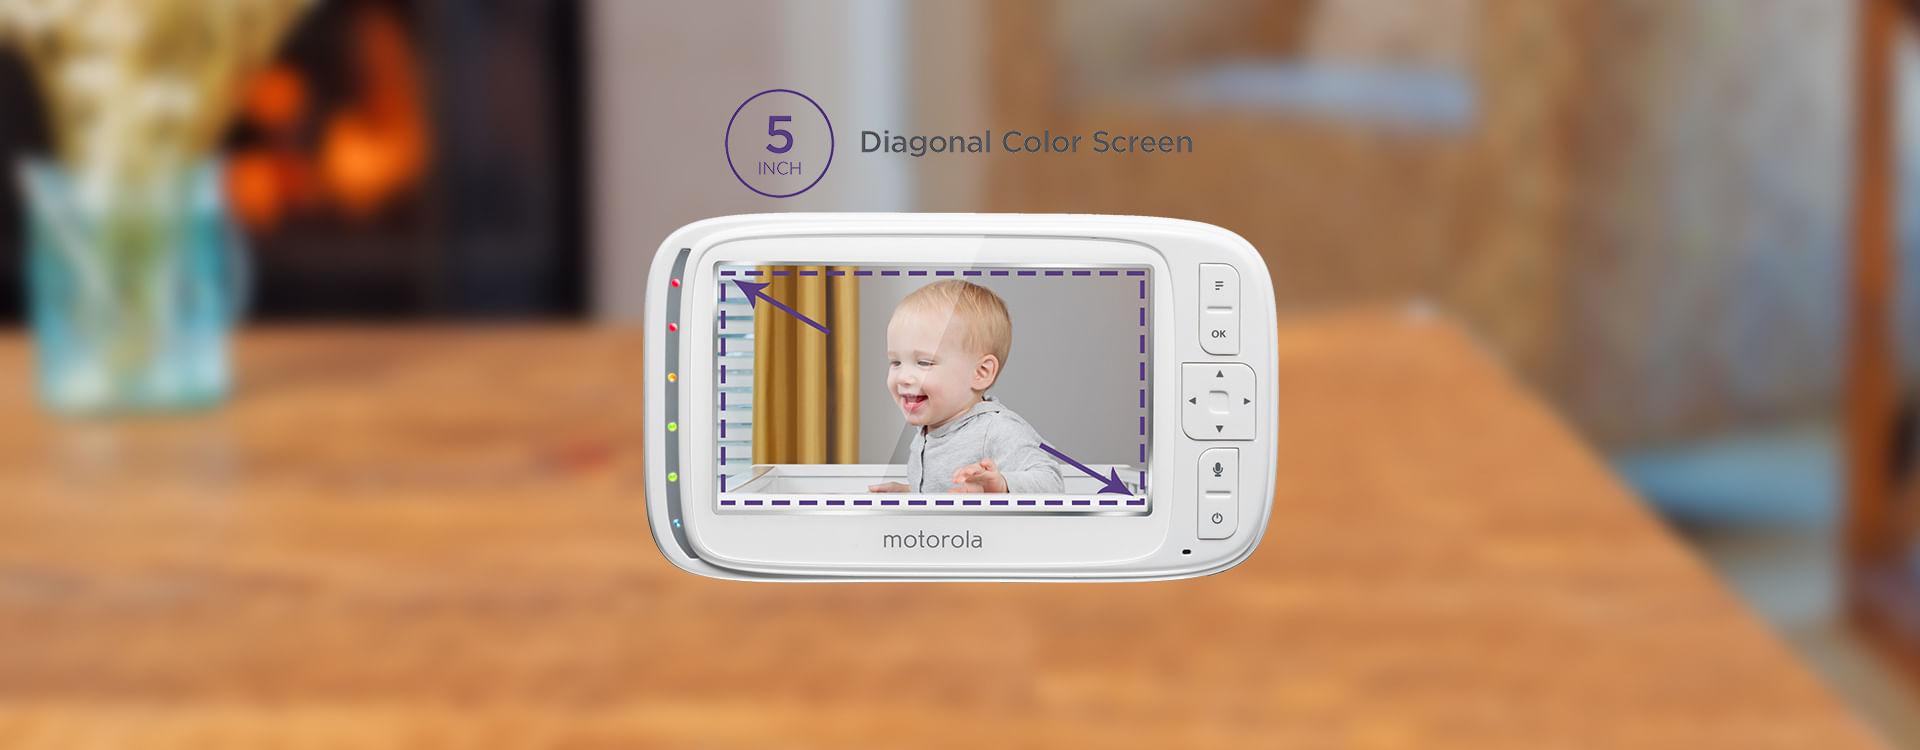 comfort50-pdp-gallery-1-screensize-d.jpg